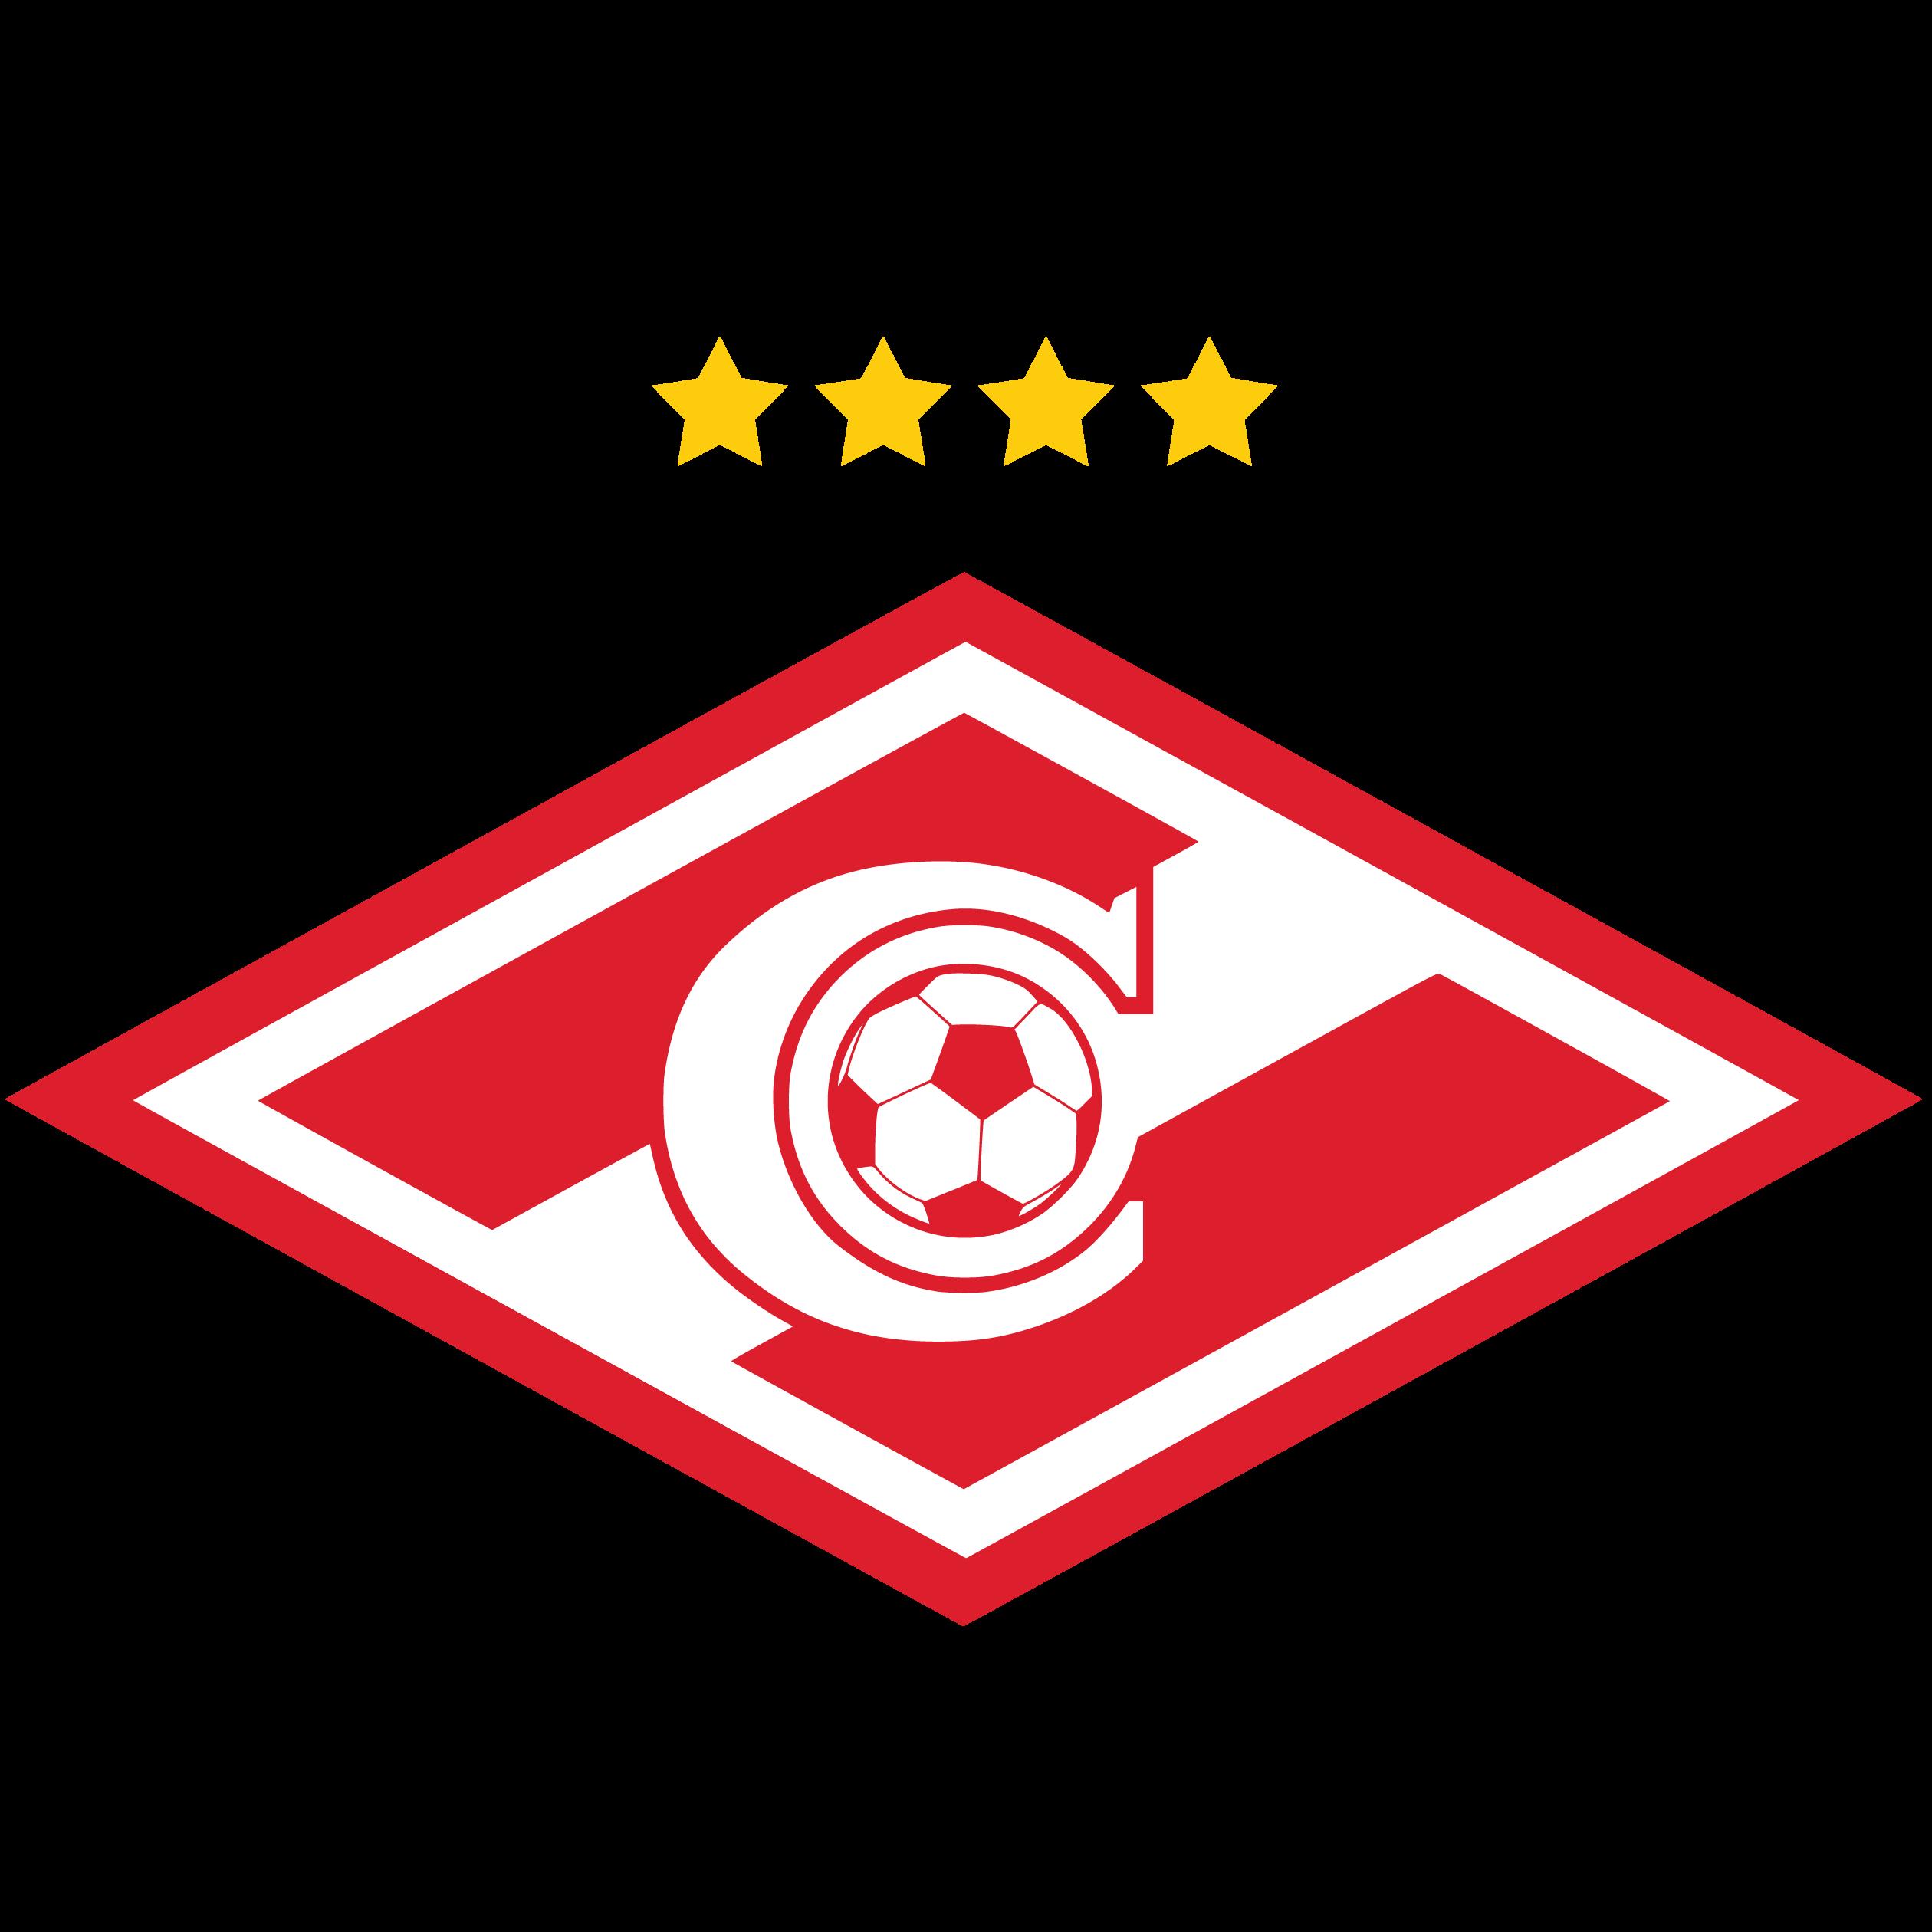 Эмблема ФК «Спартак Москва»